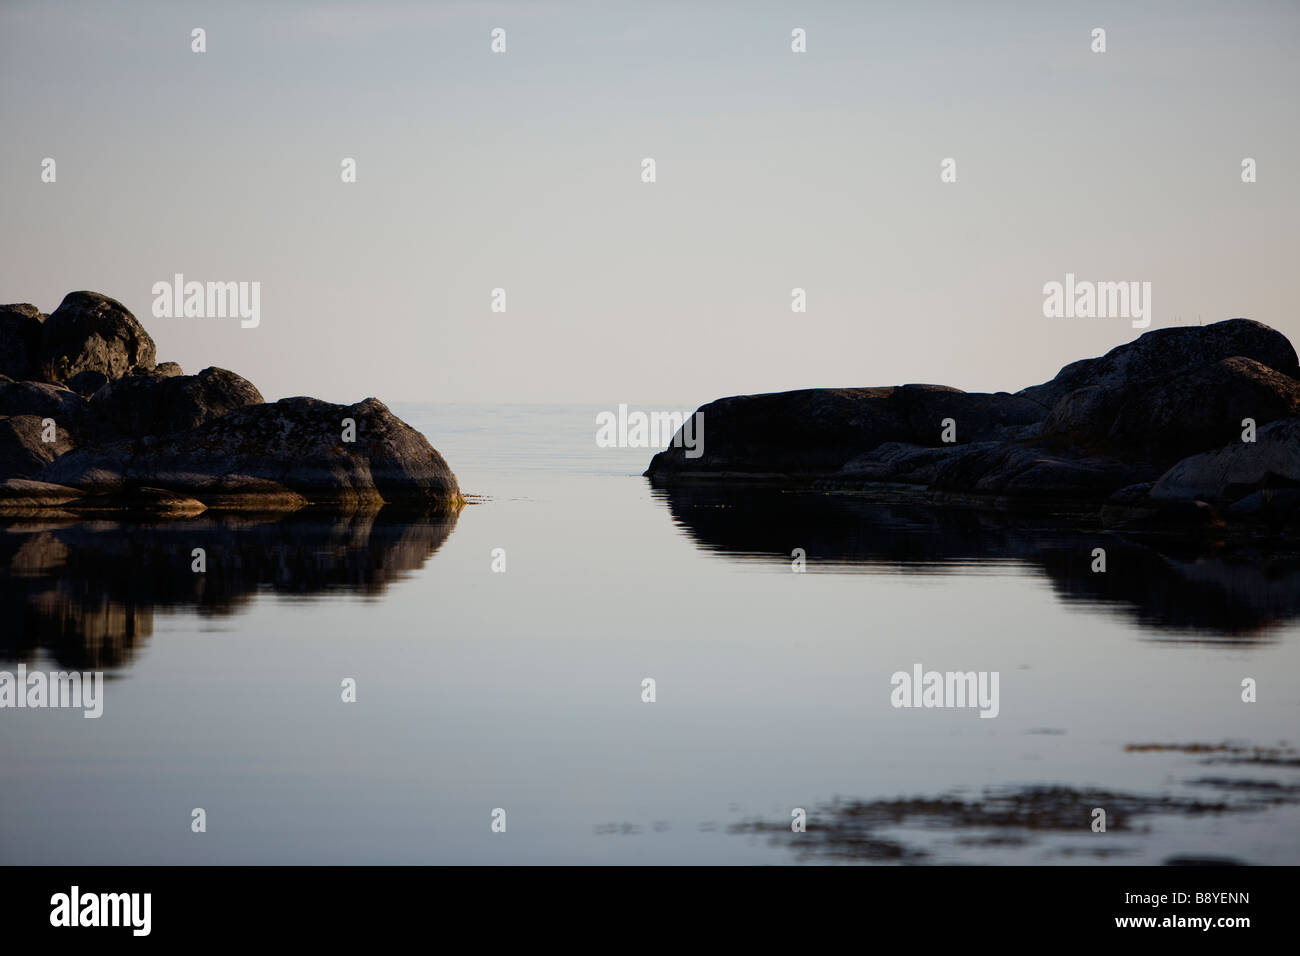 Two islands Stockholm archipelago Sweden. Stock Photo